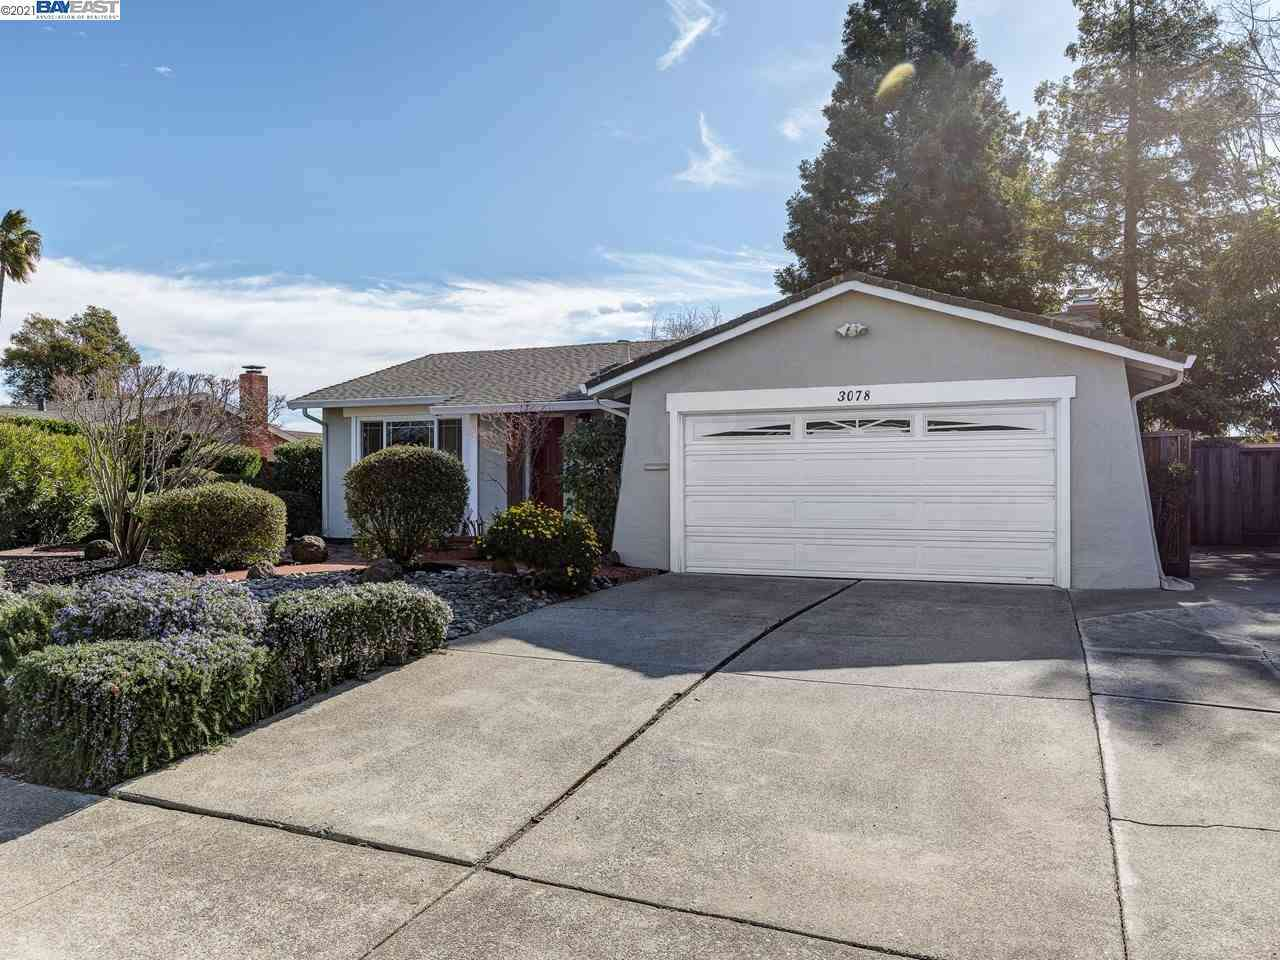 3078 Pine Valley Rd, San Ramon, CA, 94583,